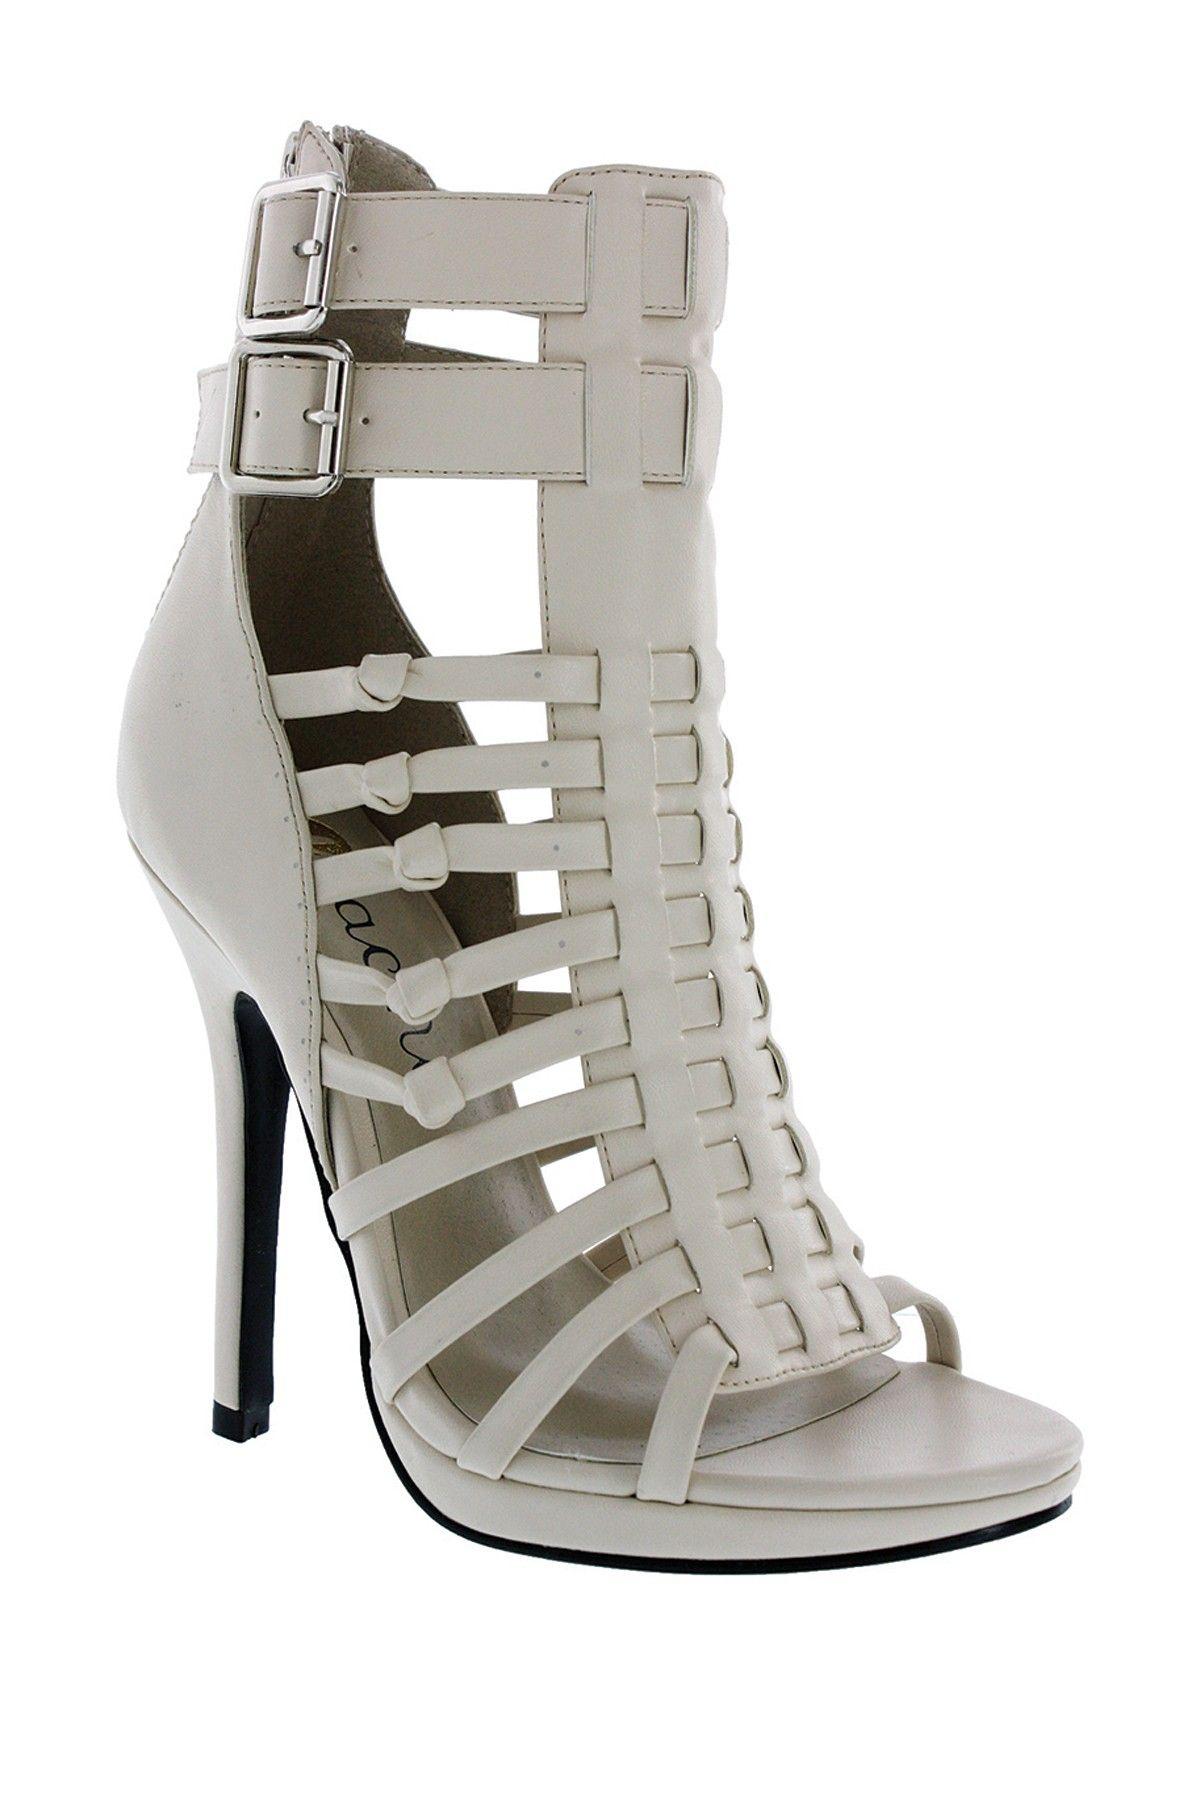 Machi Footwear Zuly Gladiator Heel love the colour